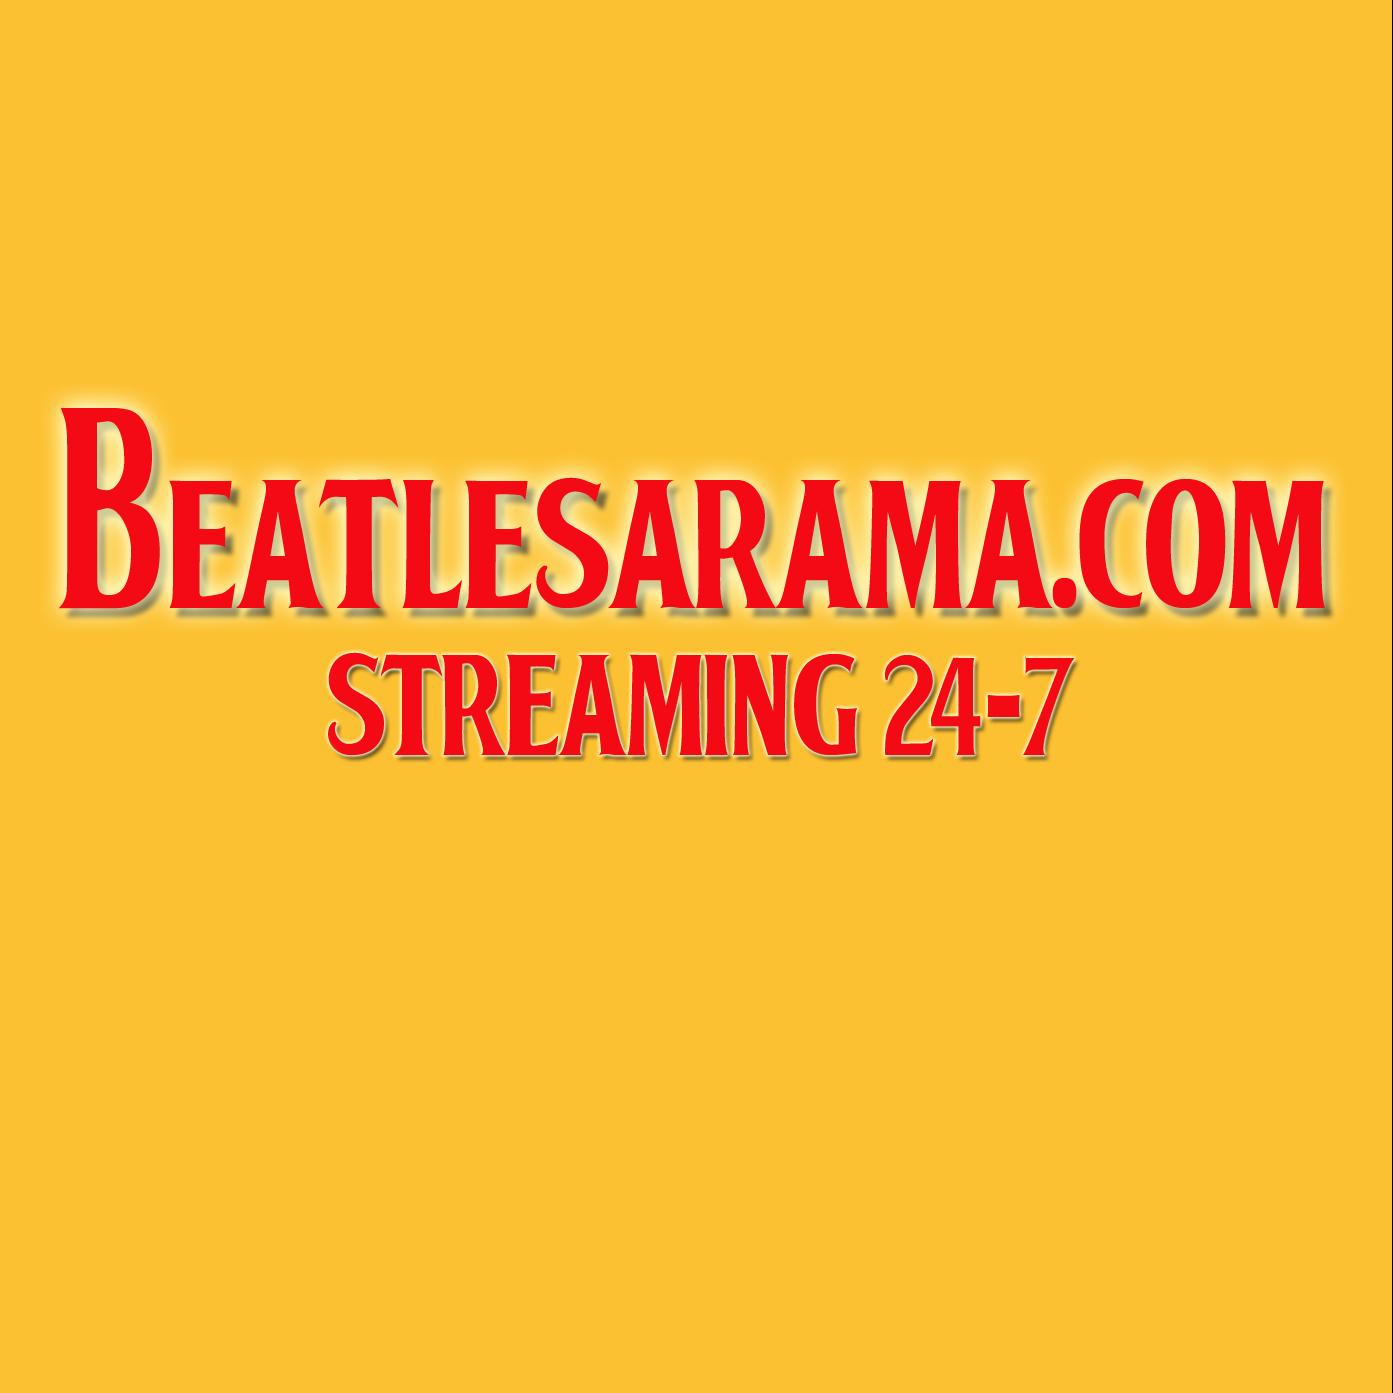 Beatles-A-Rama!!!